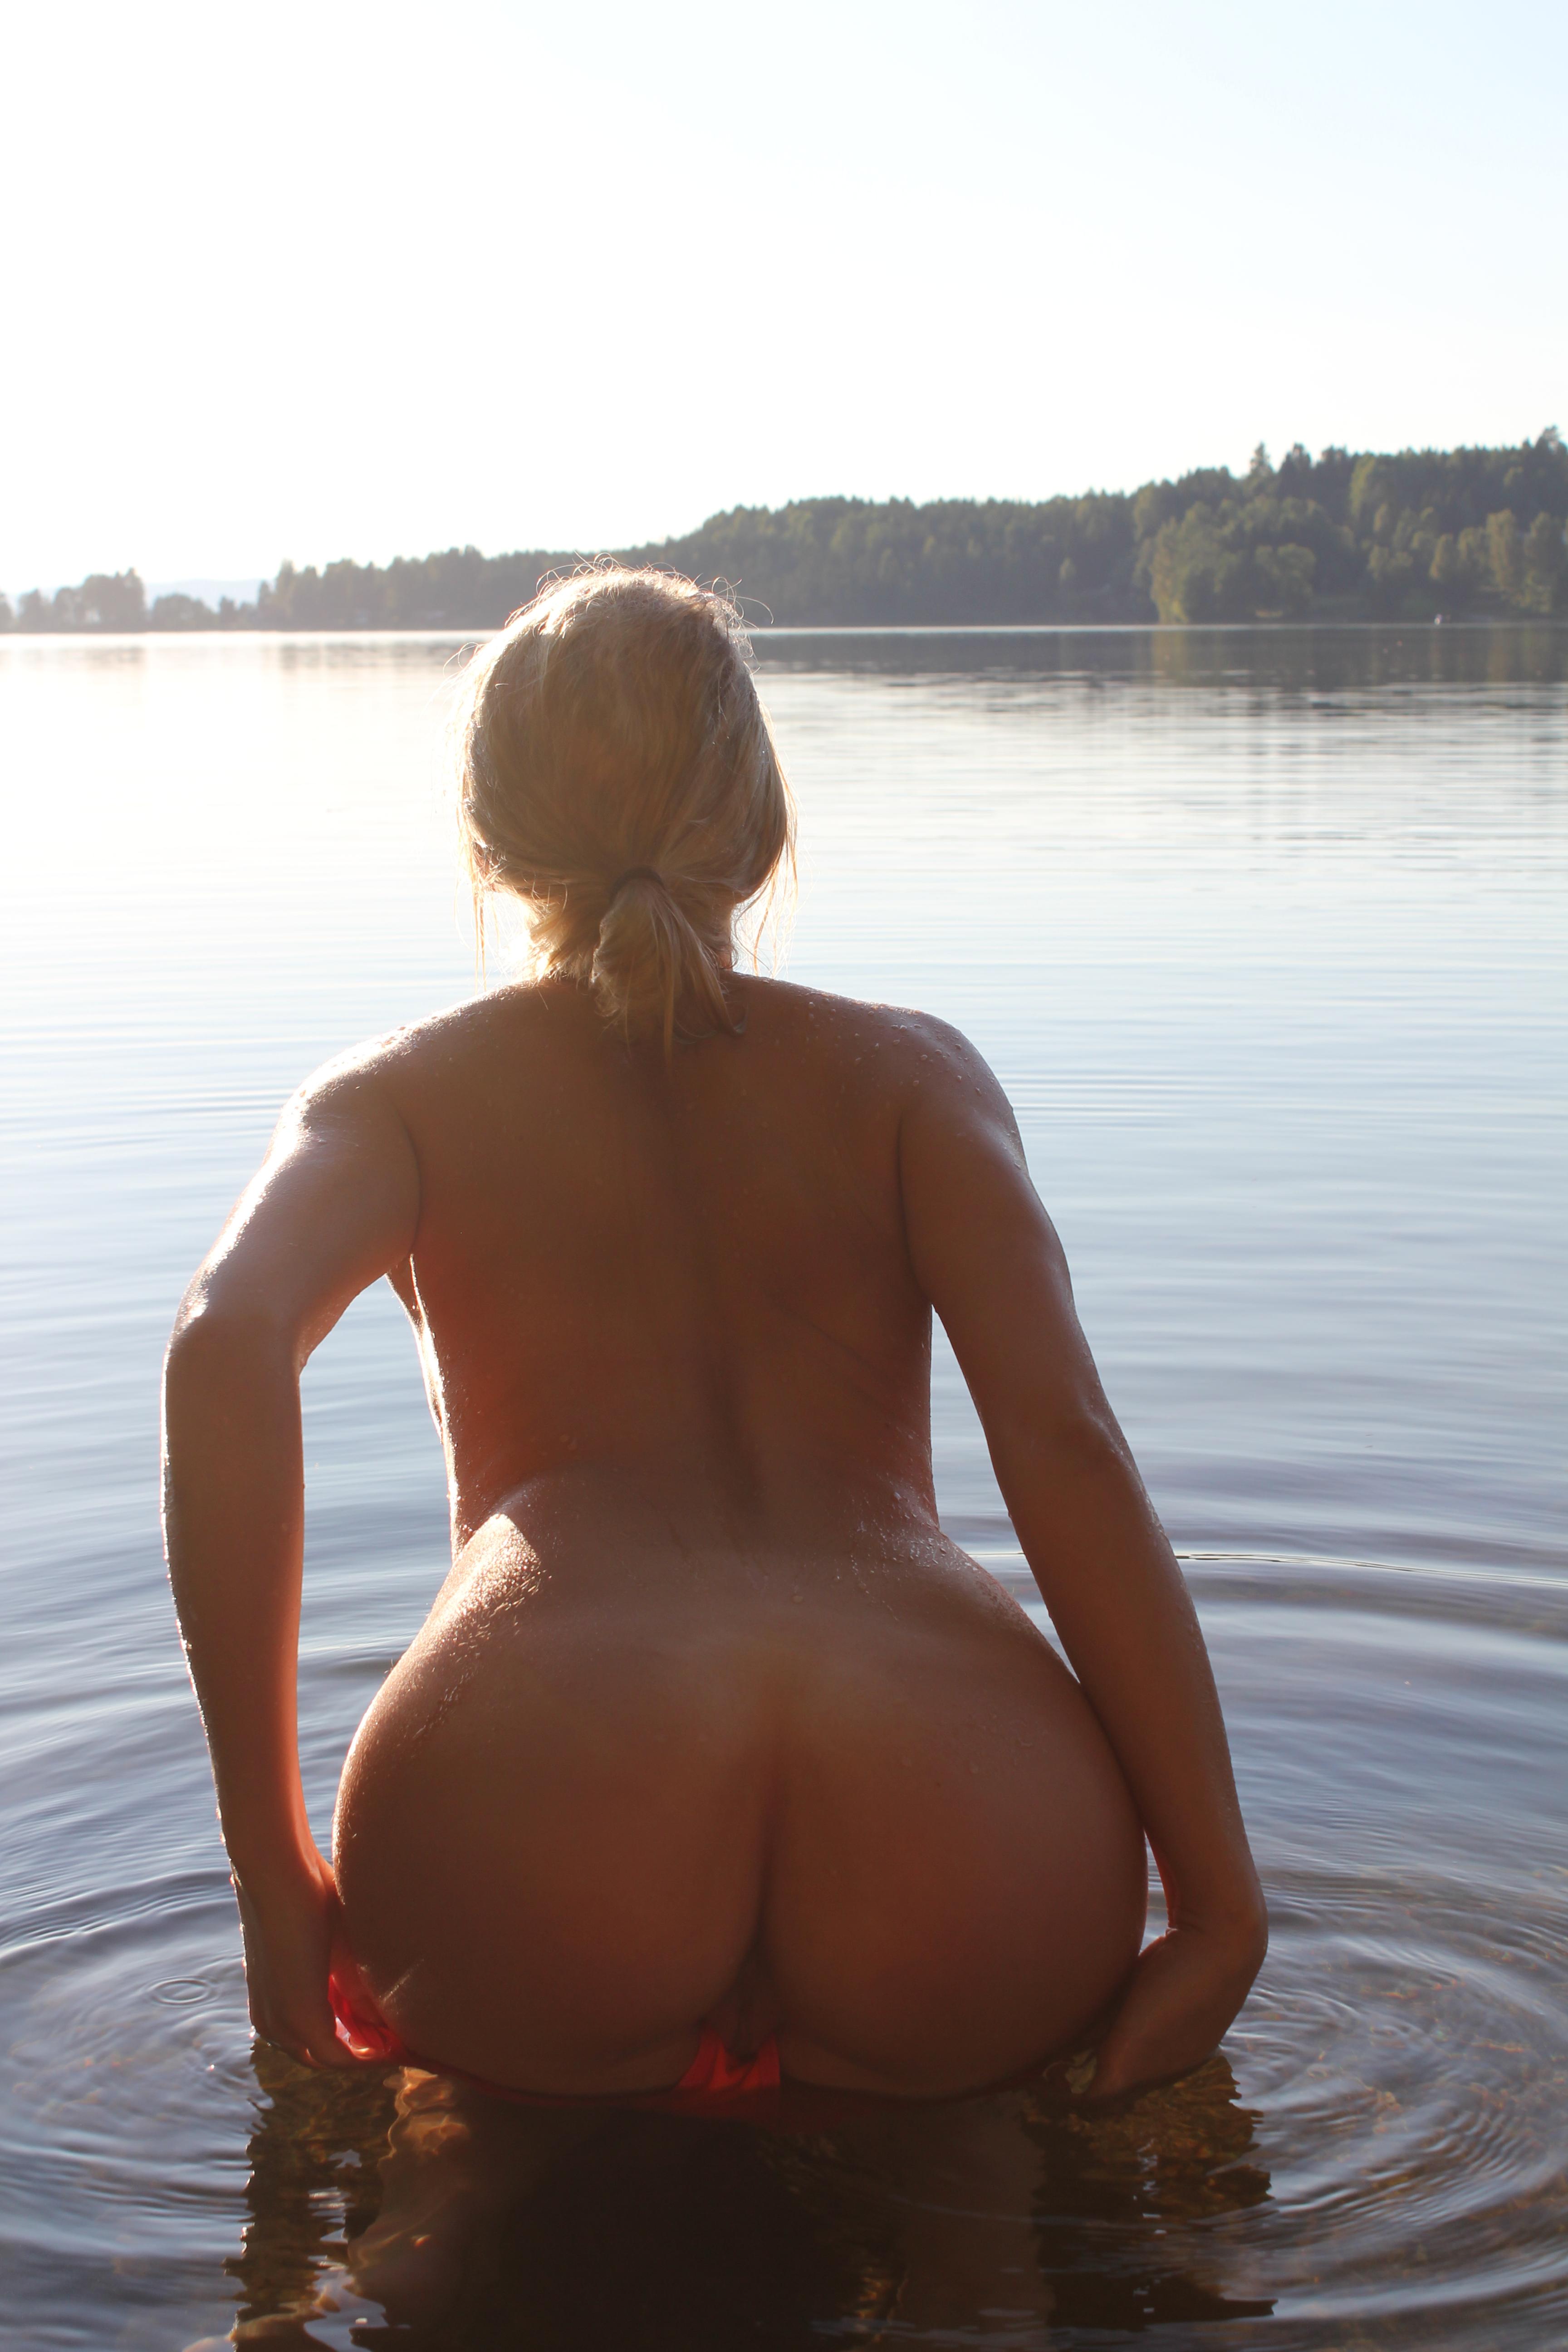 ex-girlfriend-nude-amateurs-girls-private-photo-mix-vol4-71